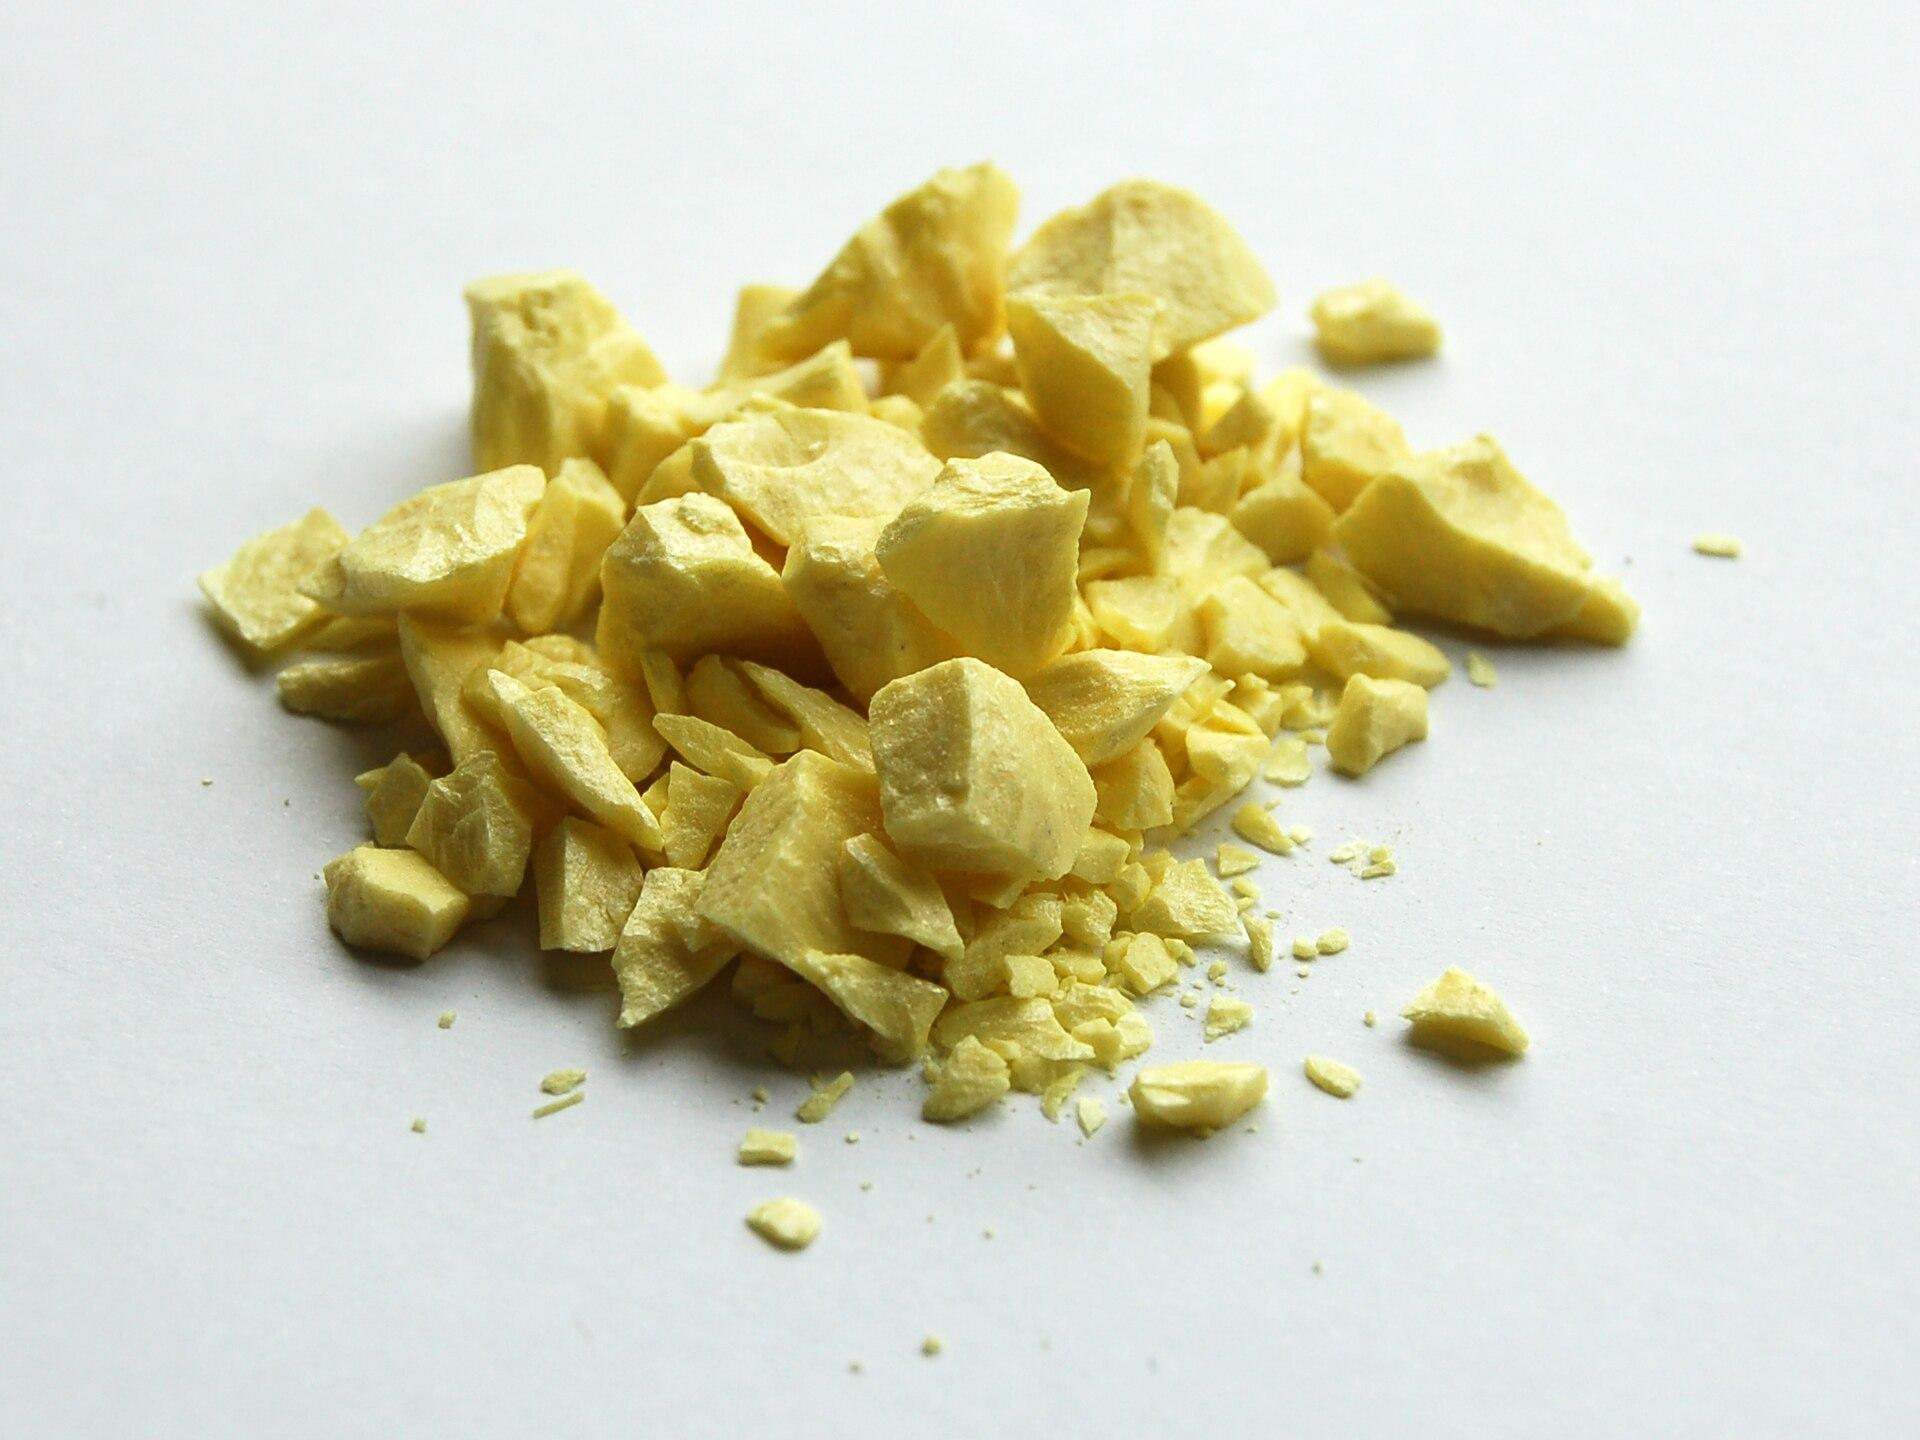 Atomic Symbol For Sulfur